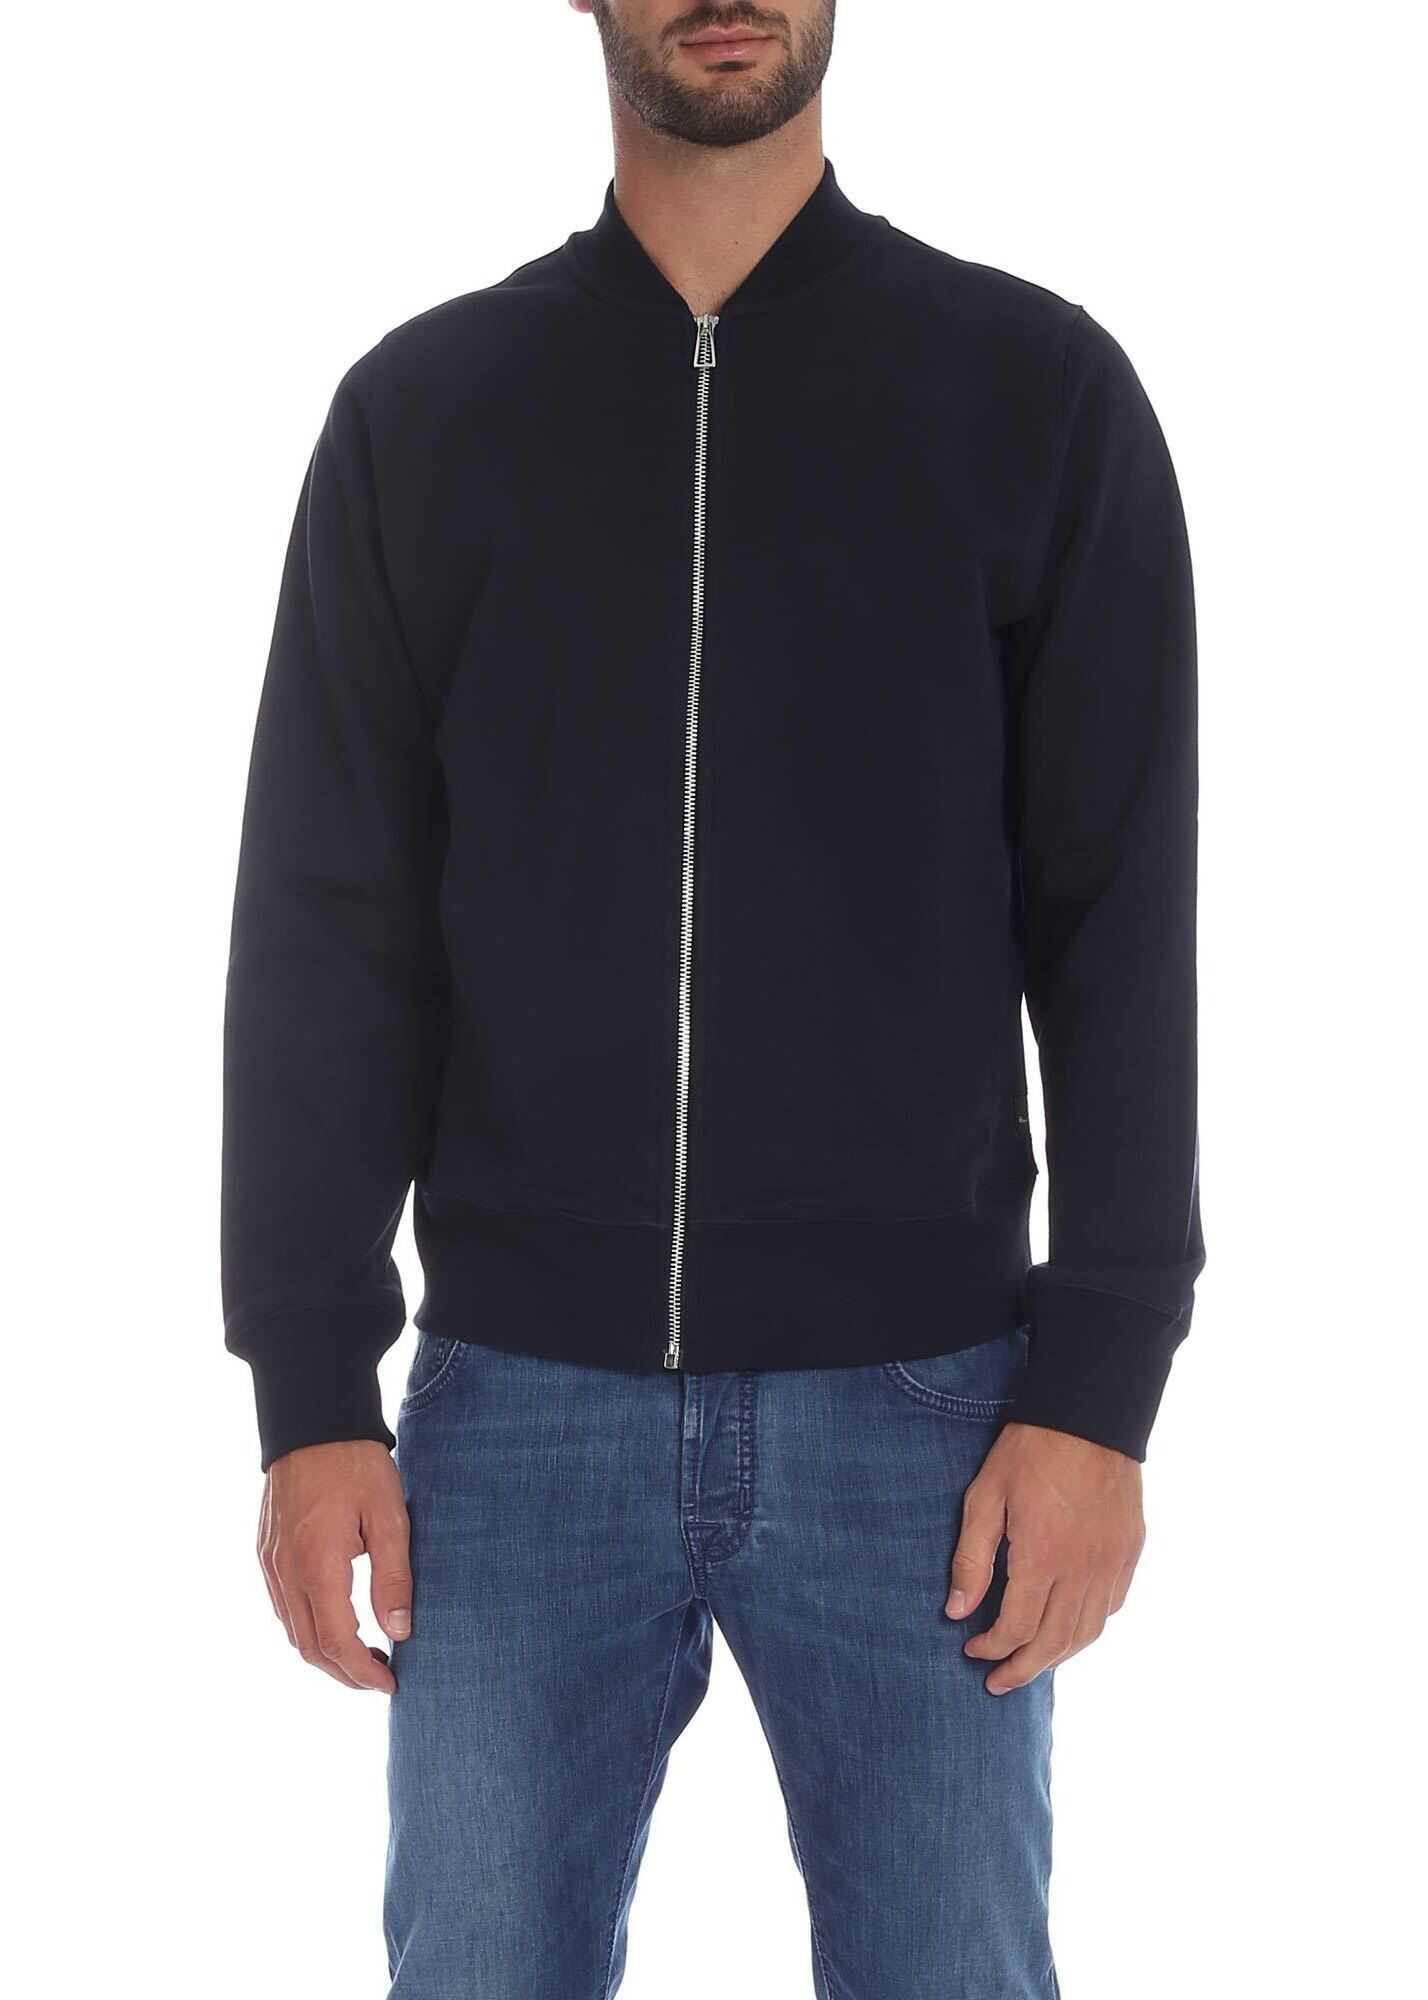 Dark Blue Sweatshirt With Branded Label thumbnail